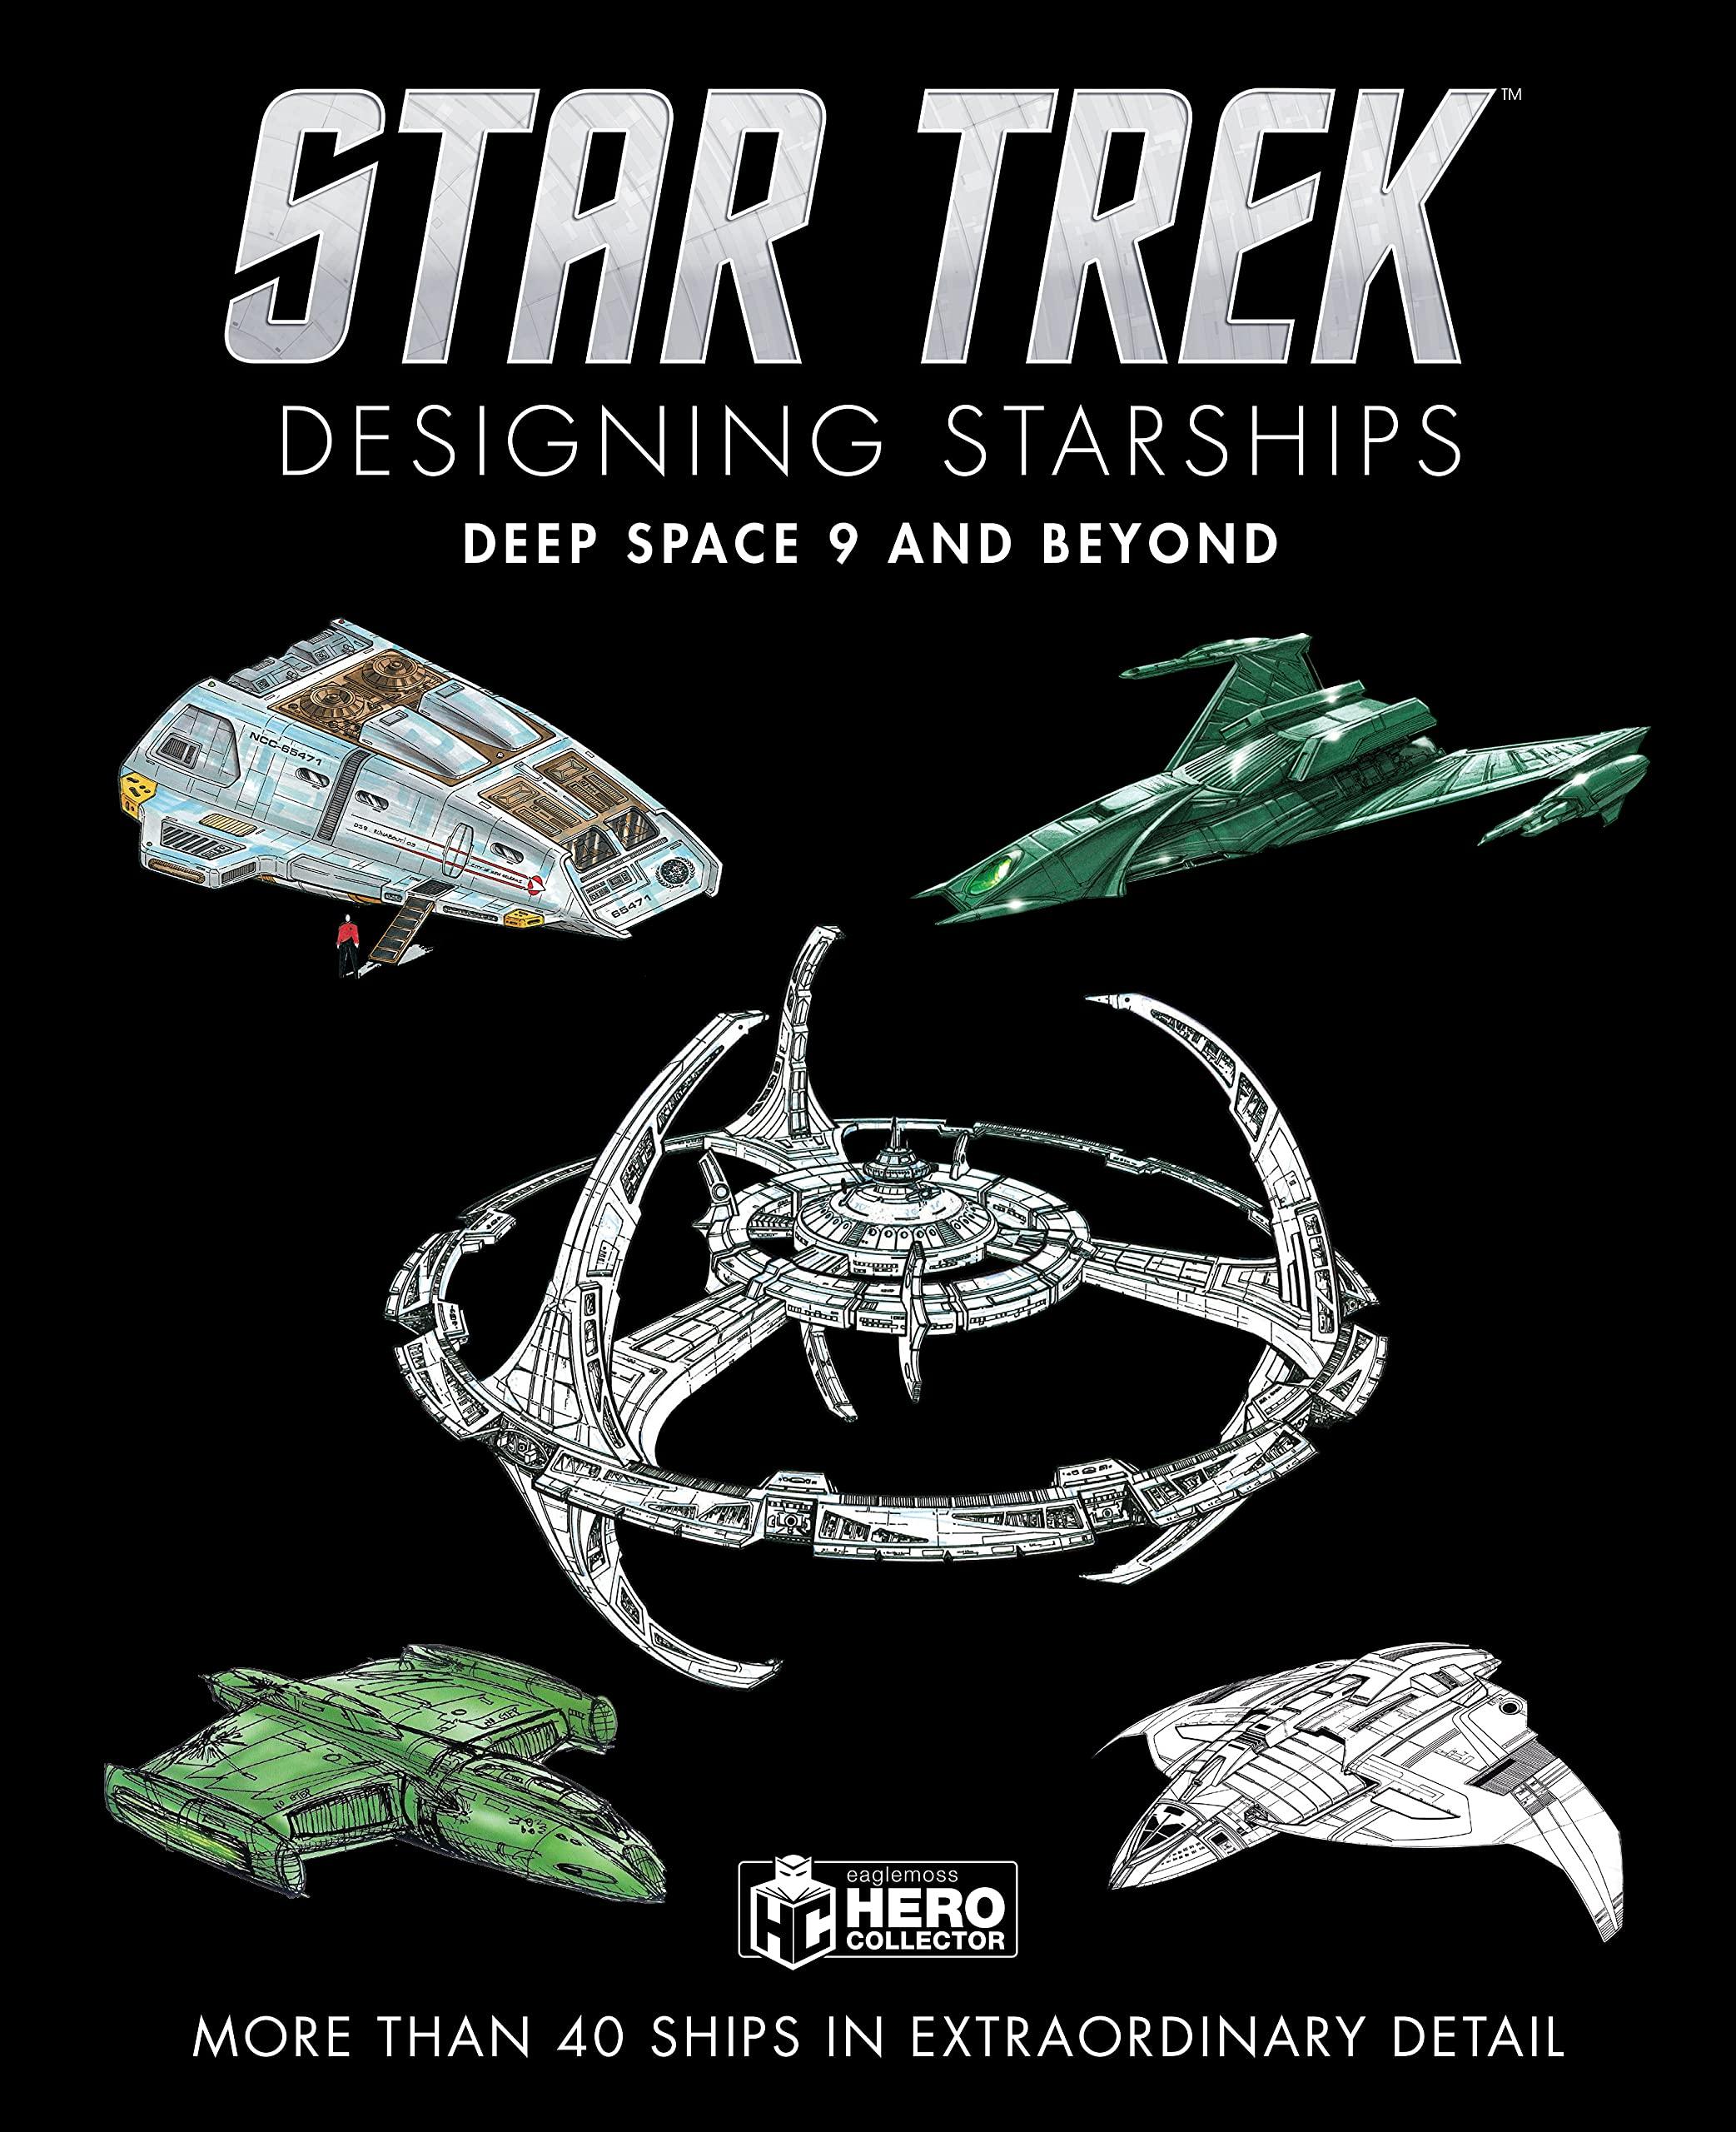 Designing Starships cover